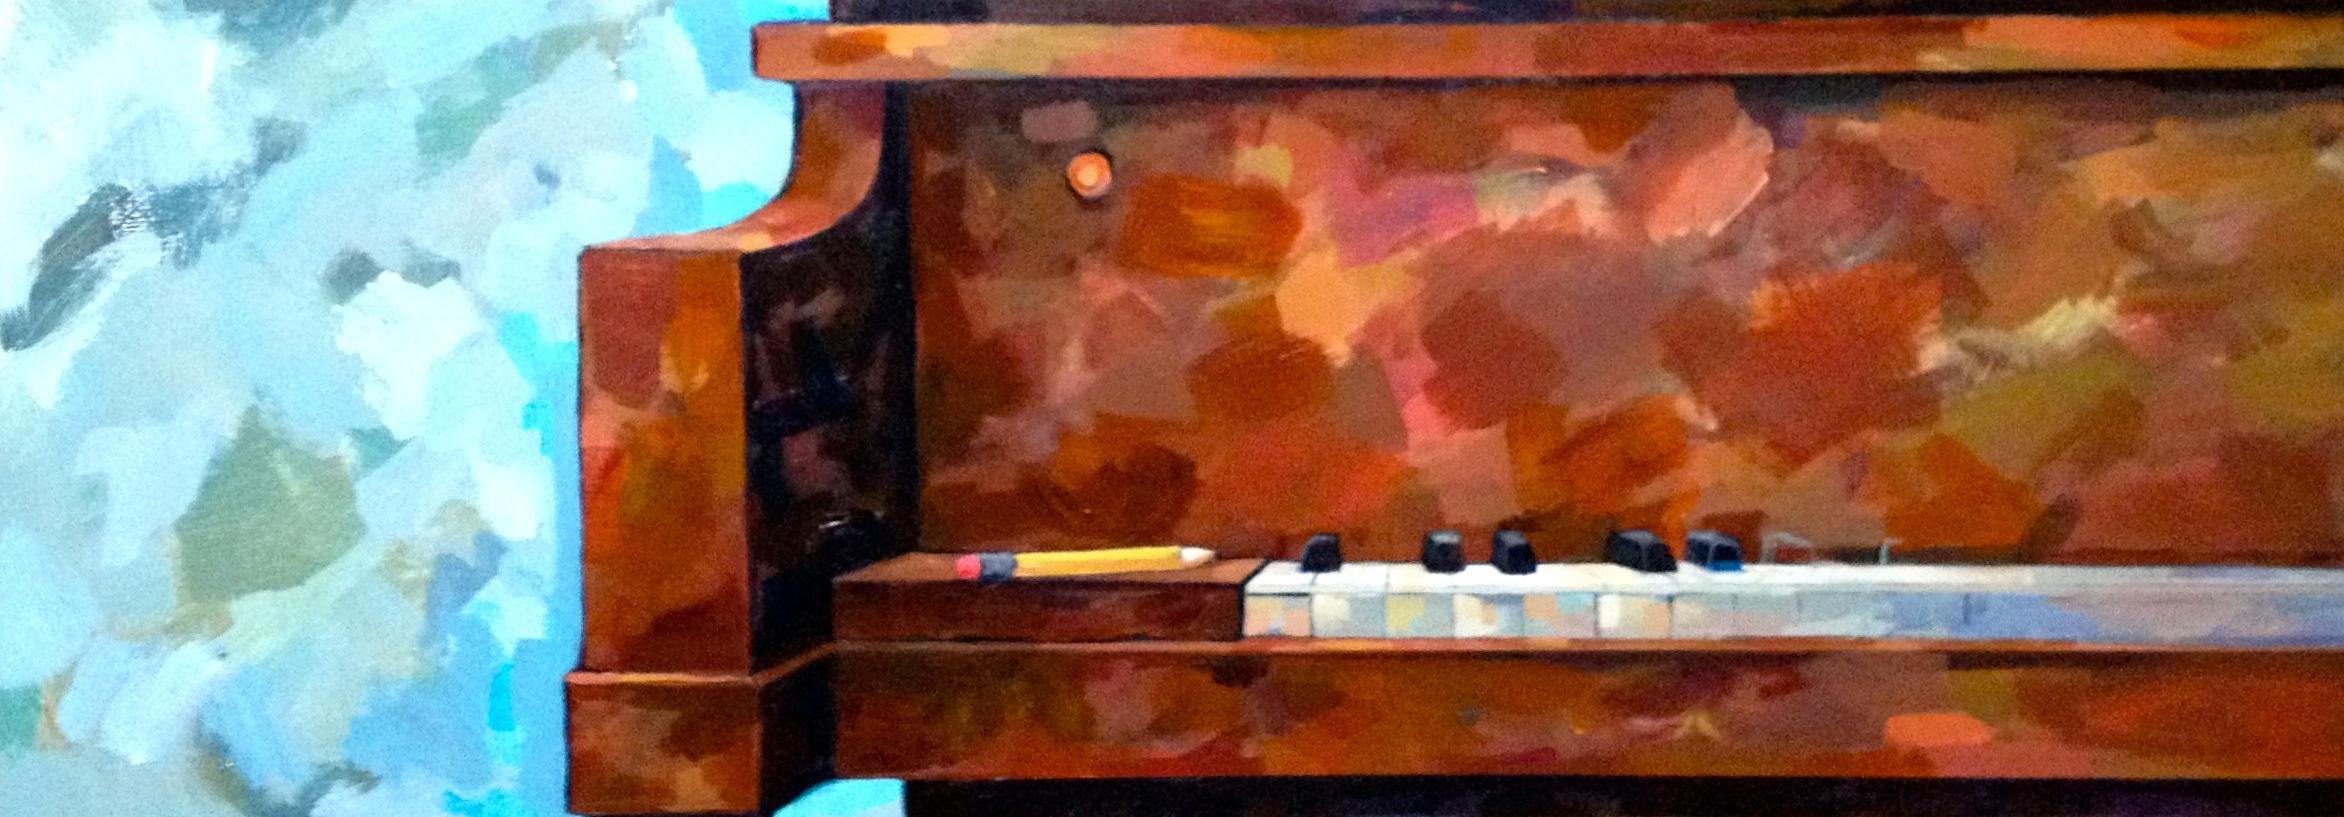 Piano and Pencil, 36 x 12